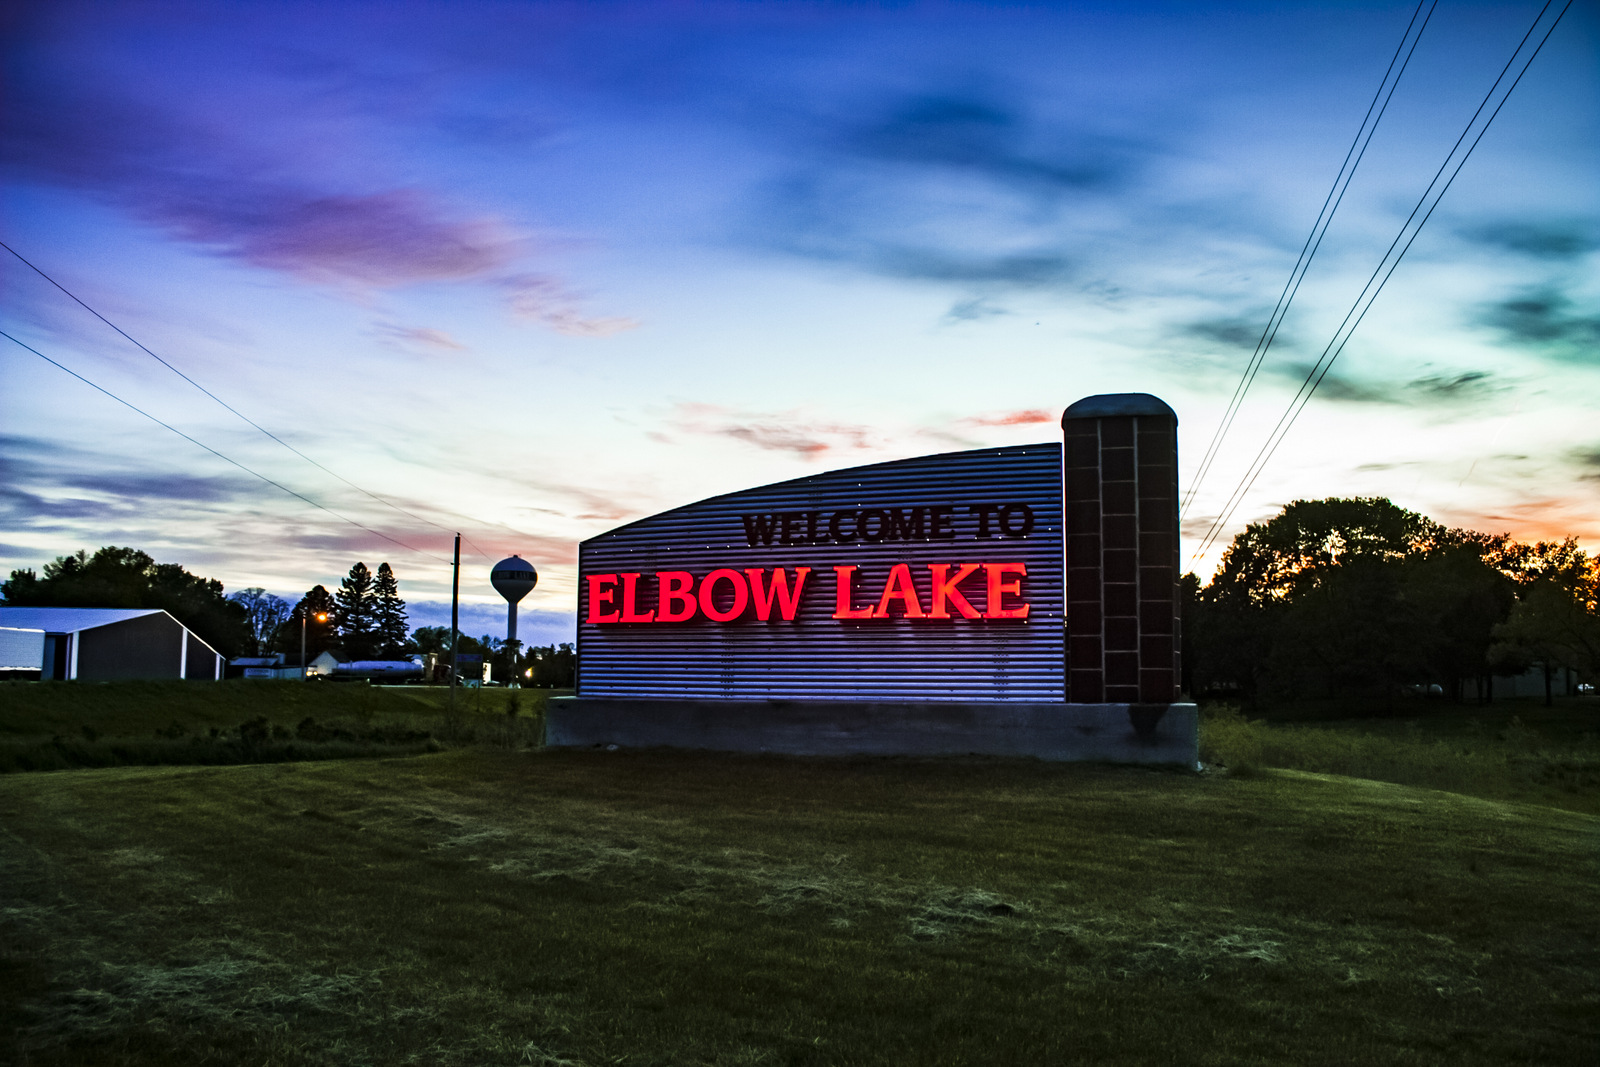 City of Elbow Lake